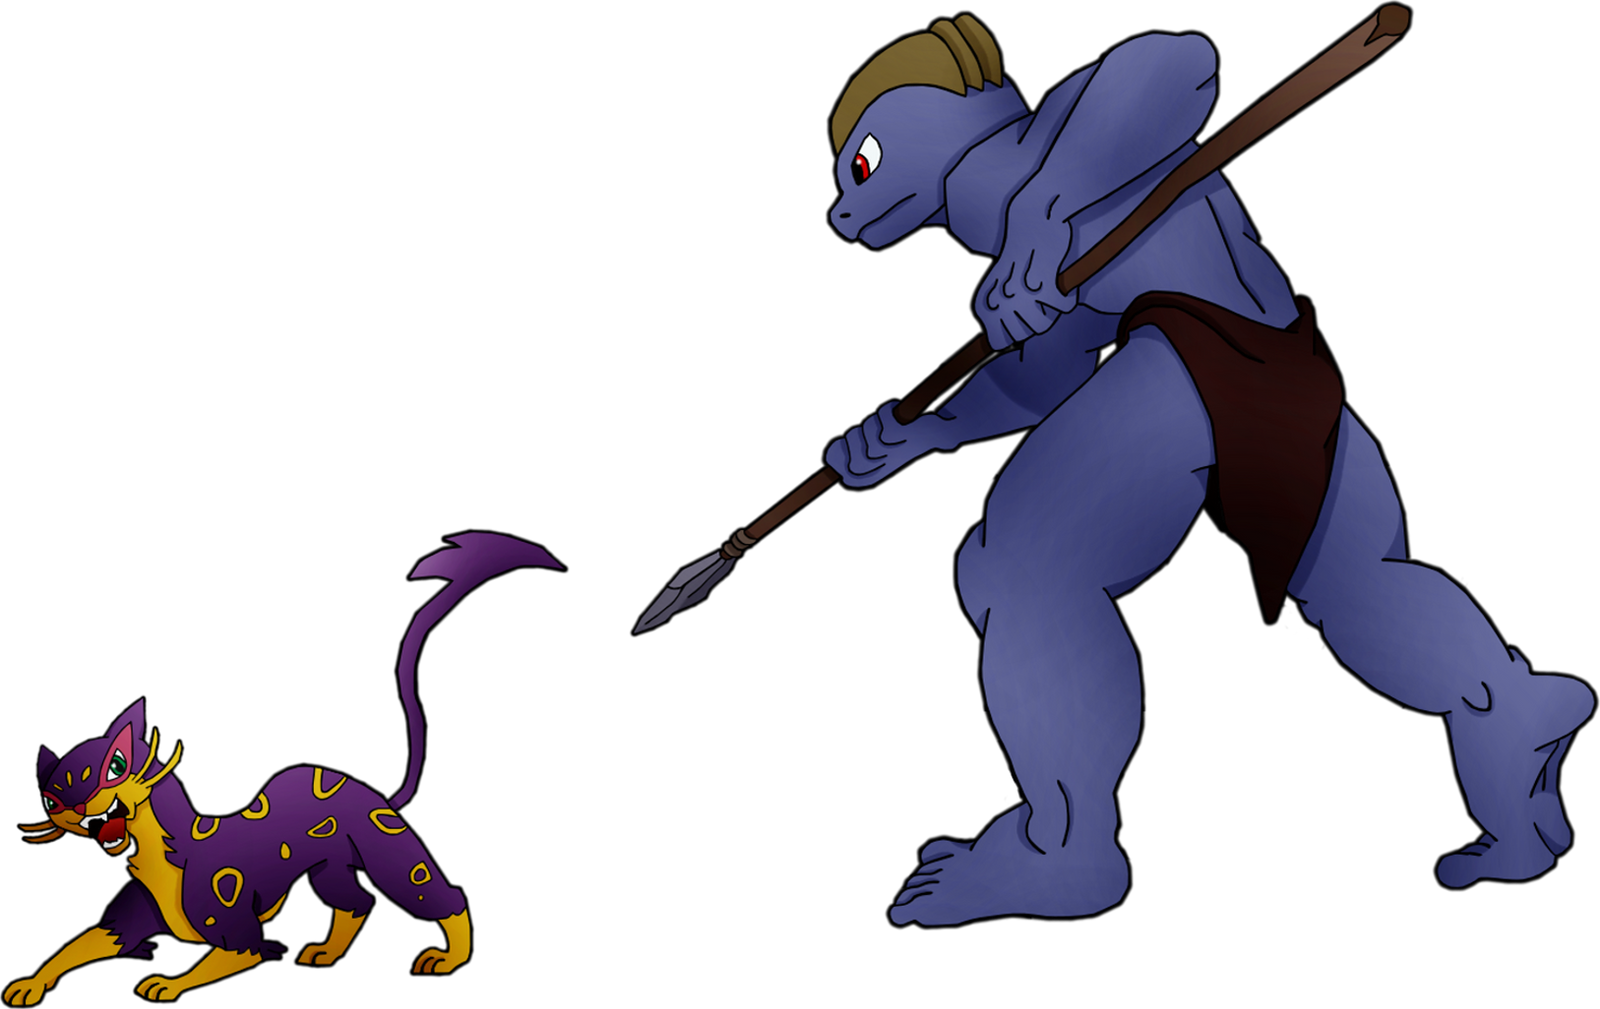 Machoke as TARZAN 2 (transparent background) by PoKeMoN-Traceur on ... Anime Fight Scene Background